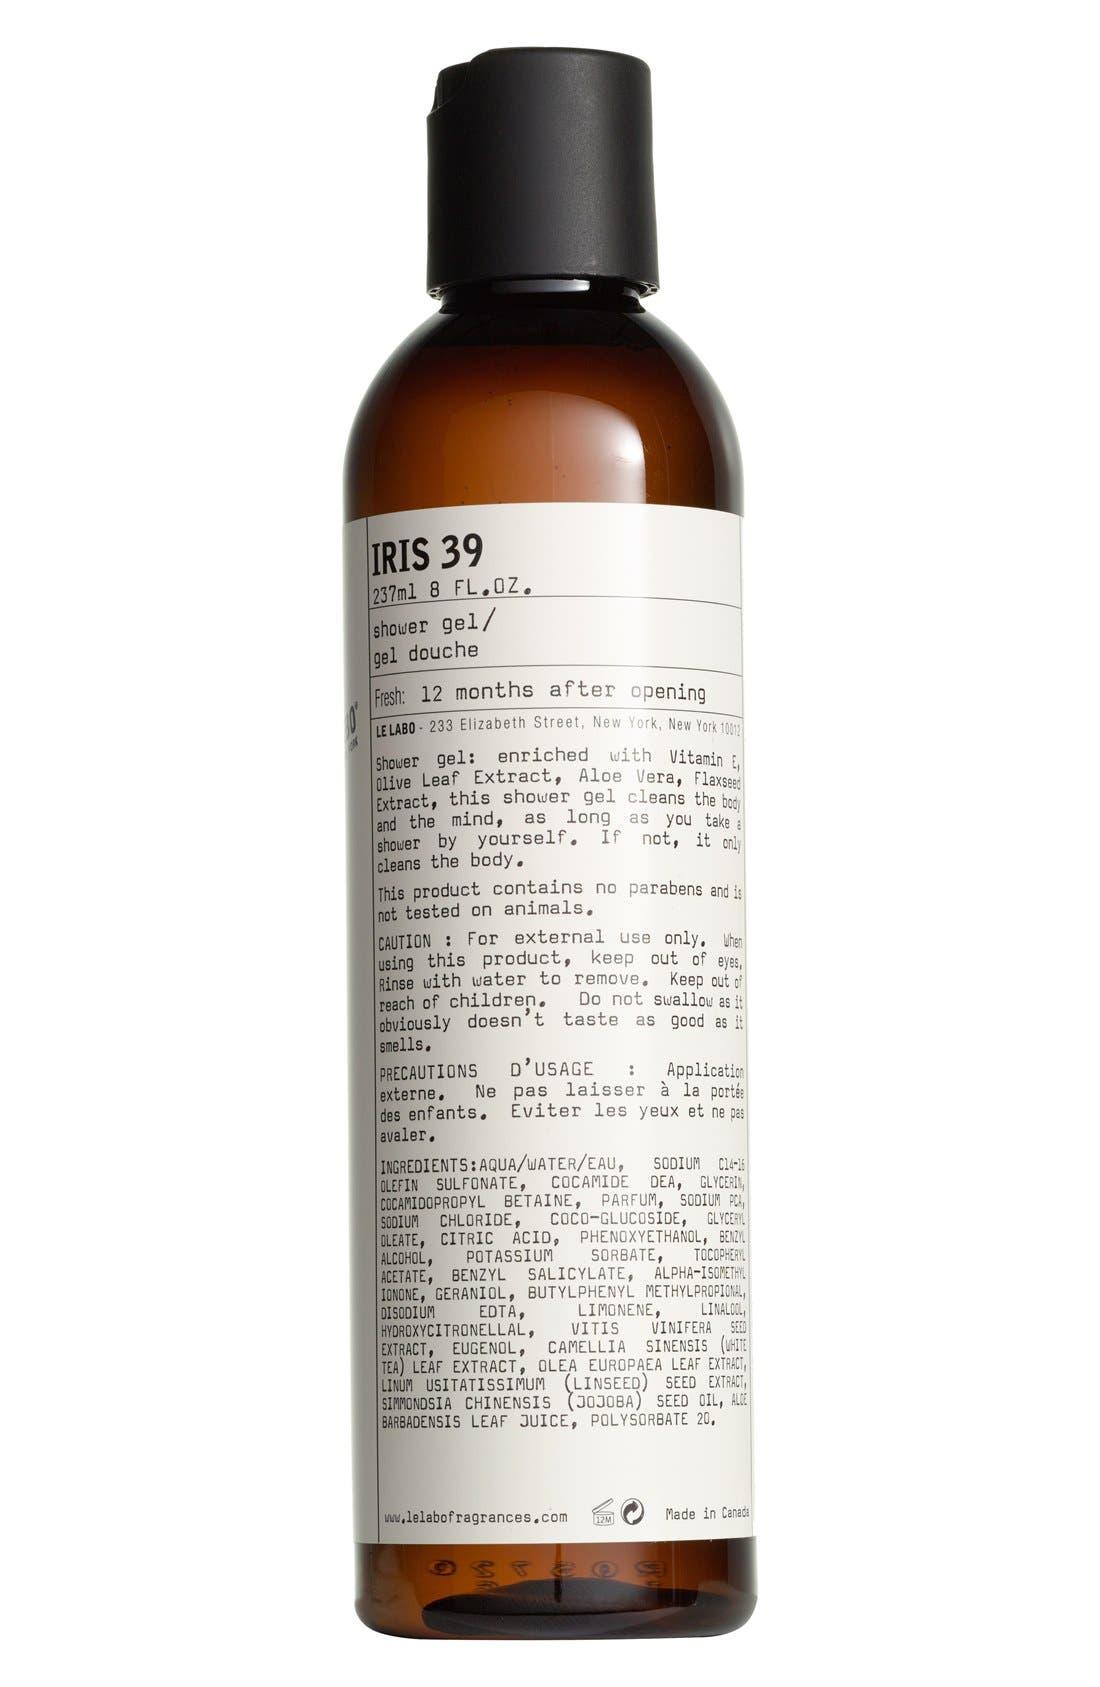 Le Labo 'Iris 39' Shower Gel